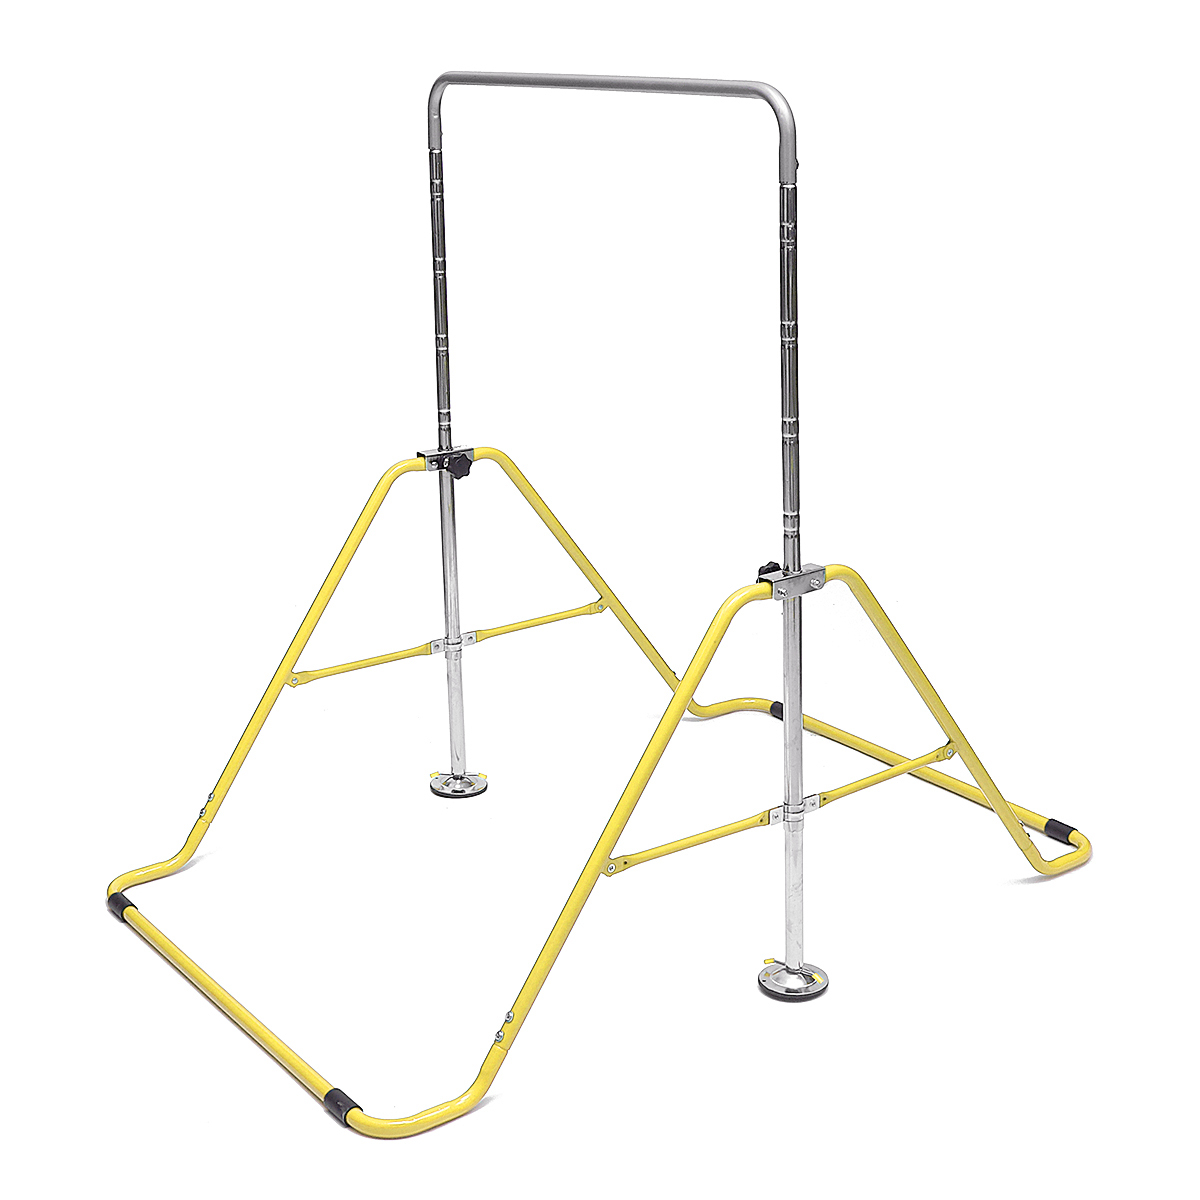 Gymnastic Bar Horizontal Training Pull Chin Up Adjustable Kids Kip Home Gym Expandable High Play Toy